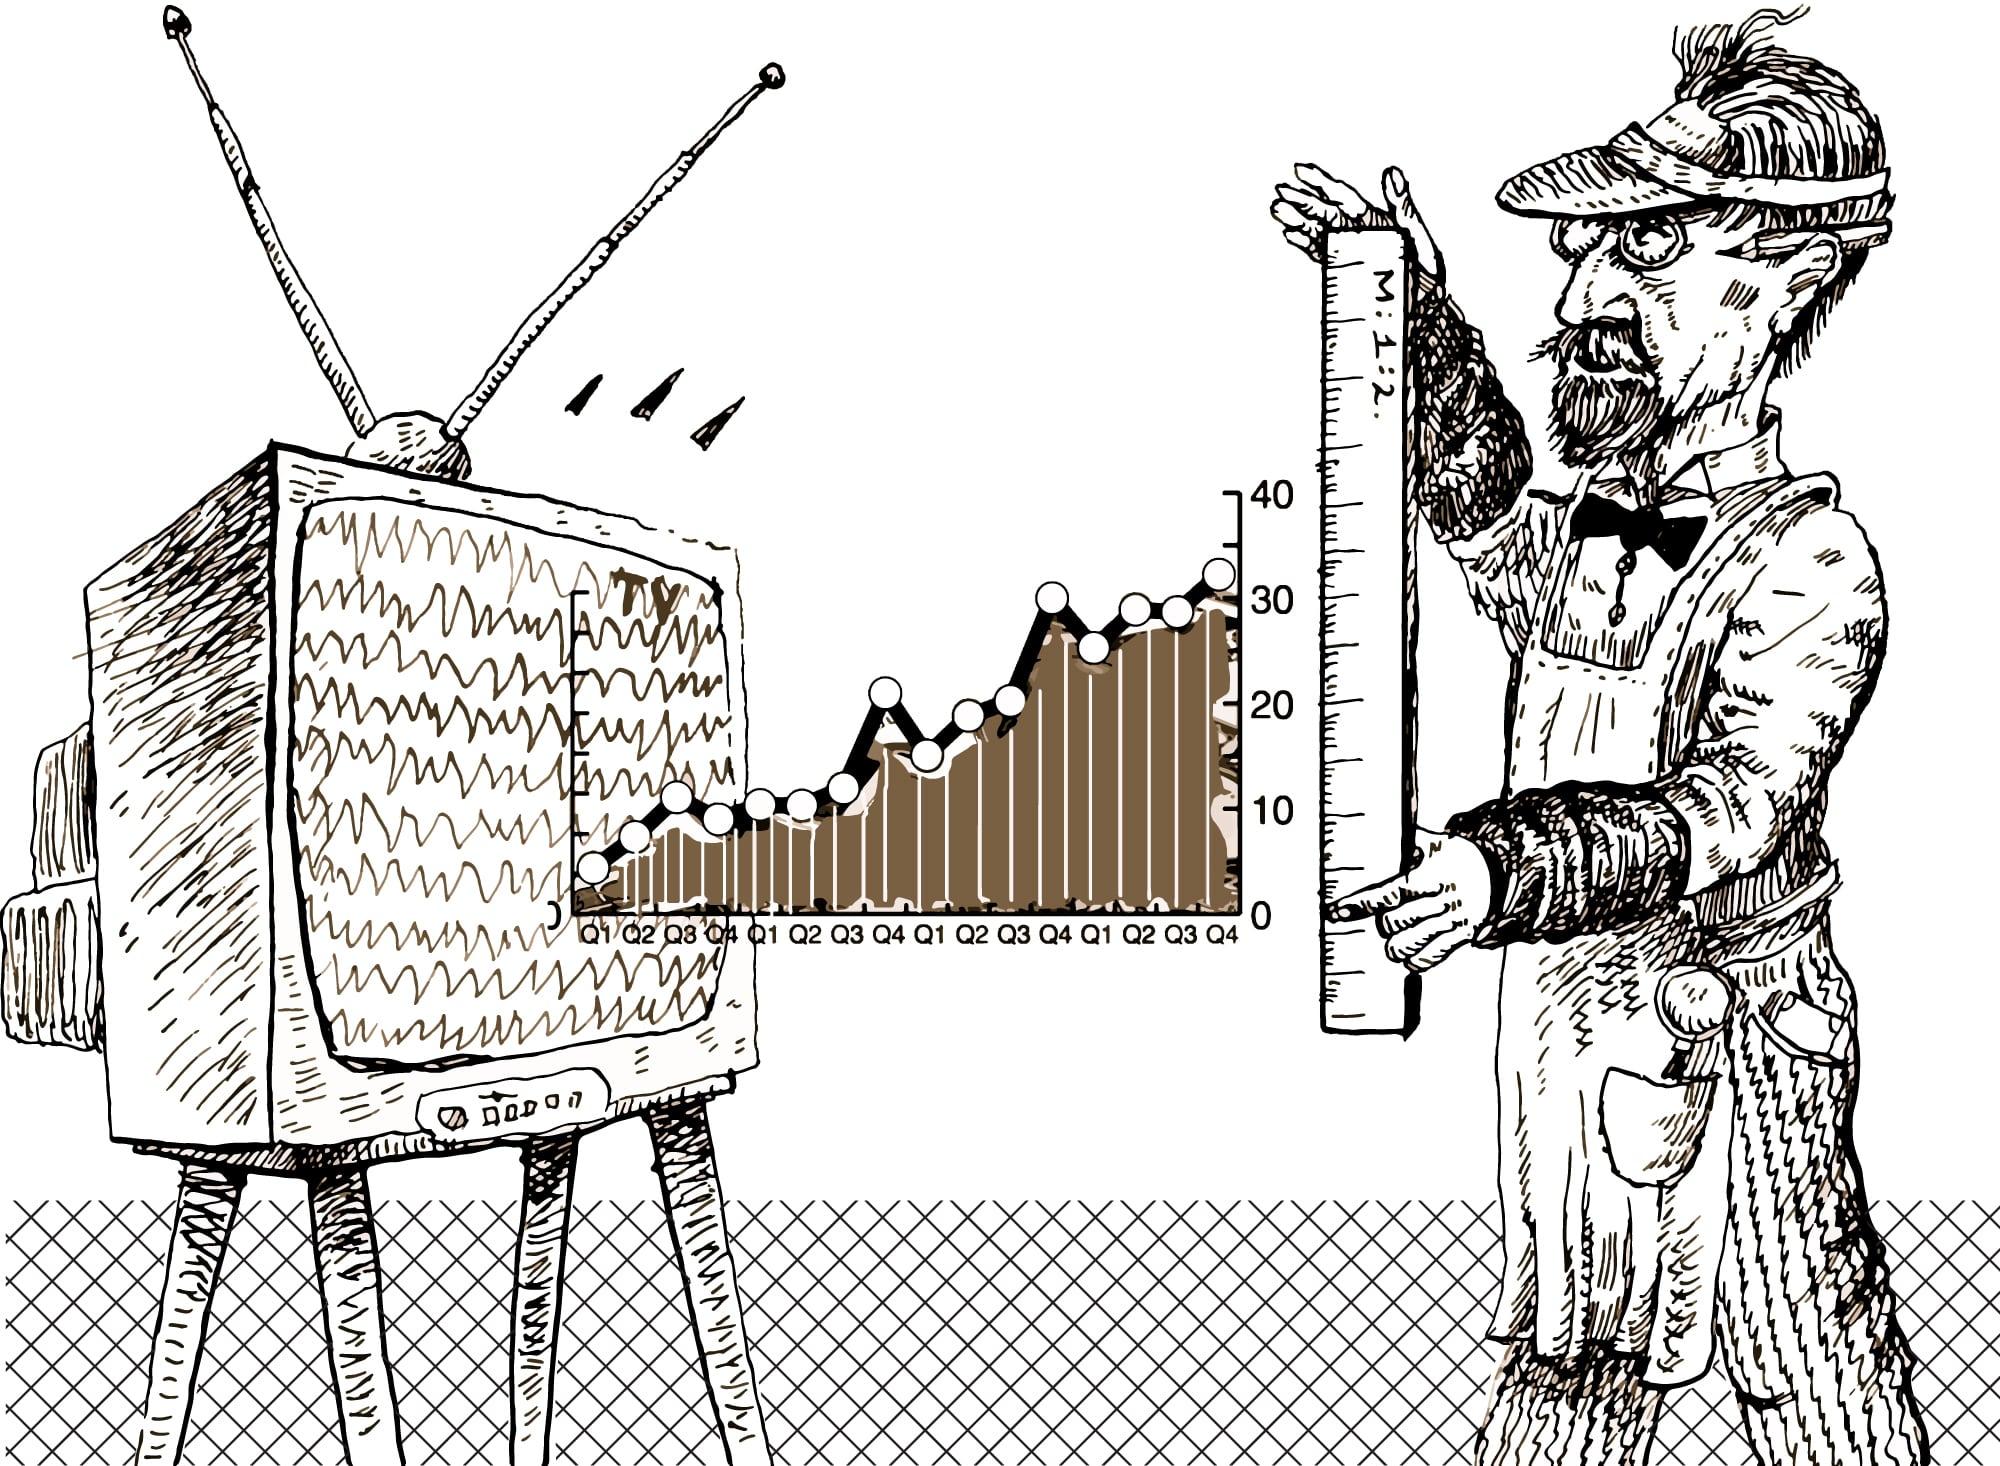 Nielsen Ratings comScore